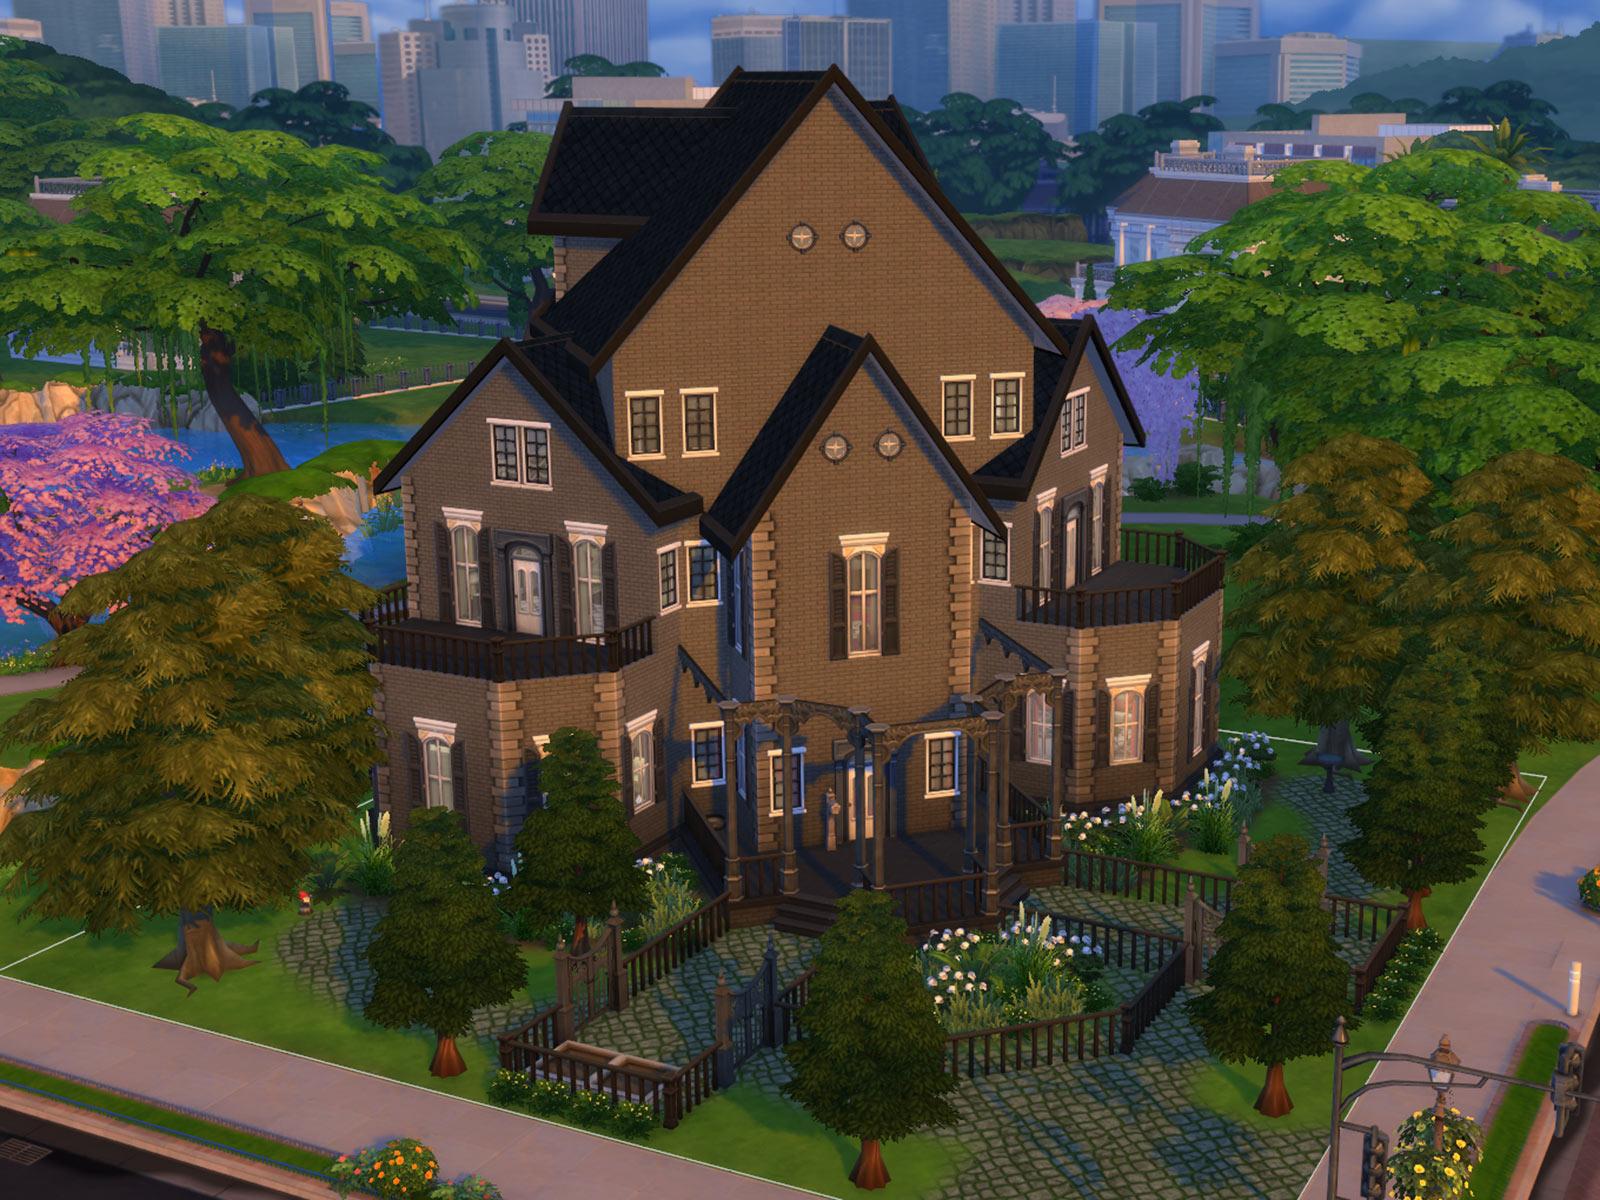 Parsimonious: The Sims 4